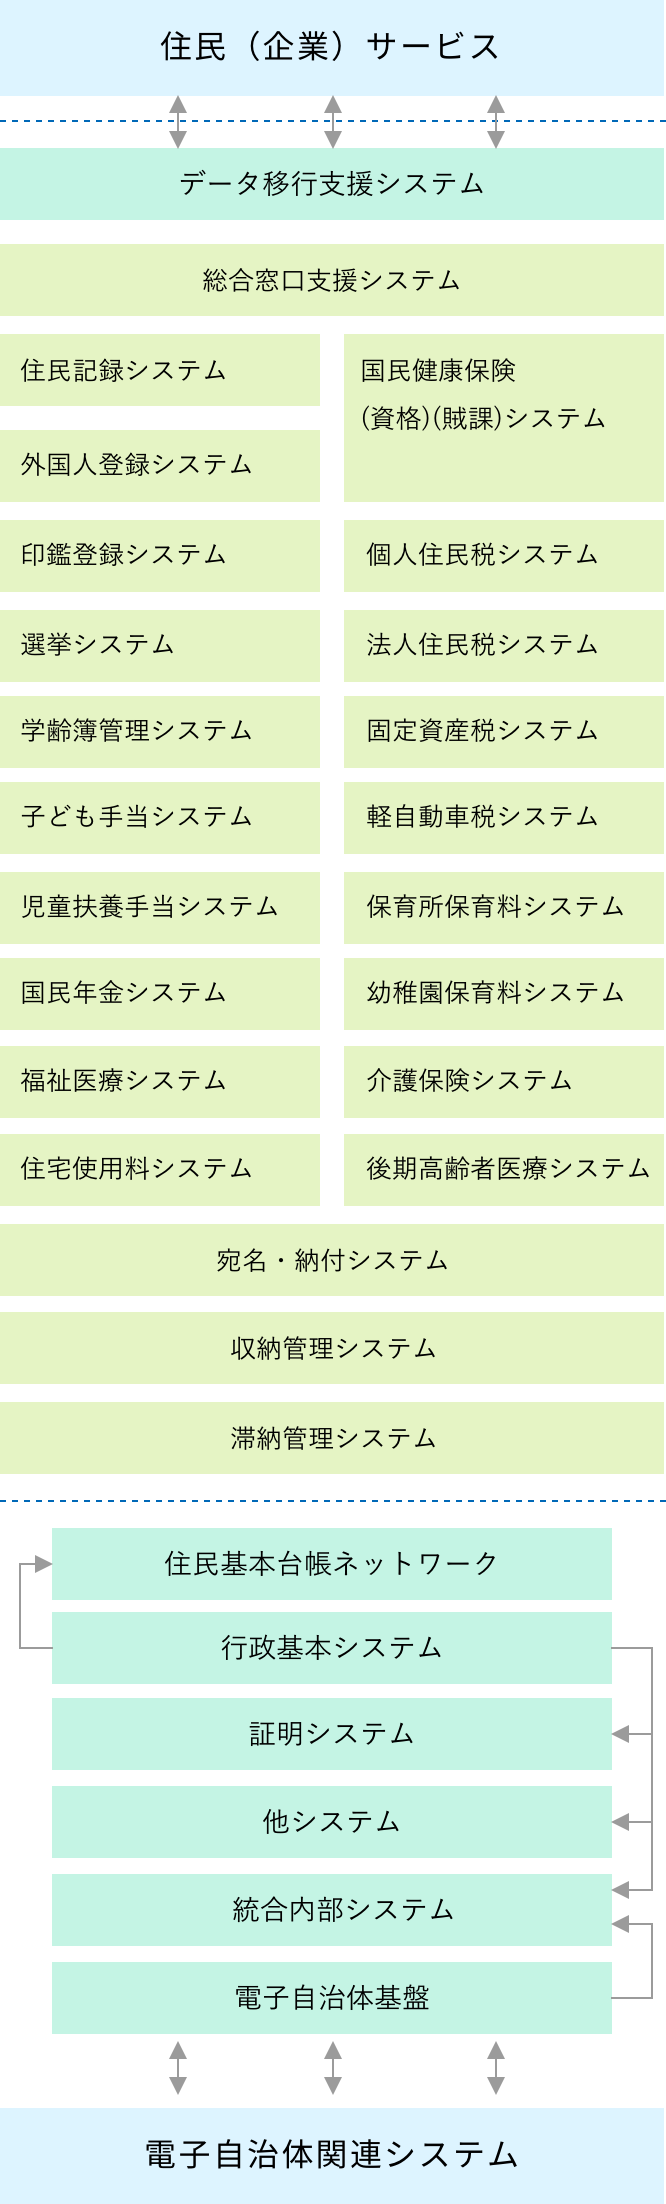 COKAS-R/ADⅡ システム体系・システム概要